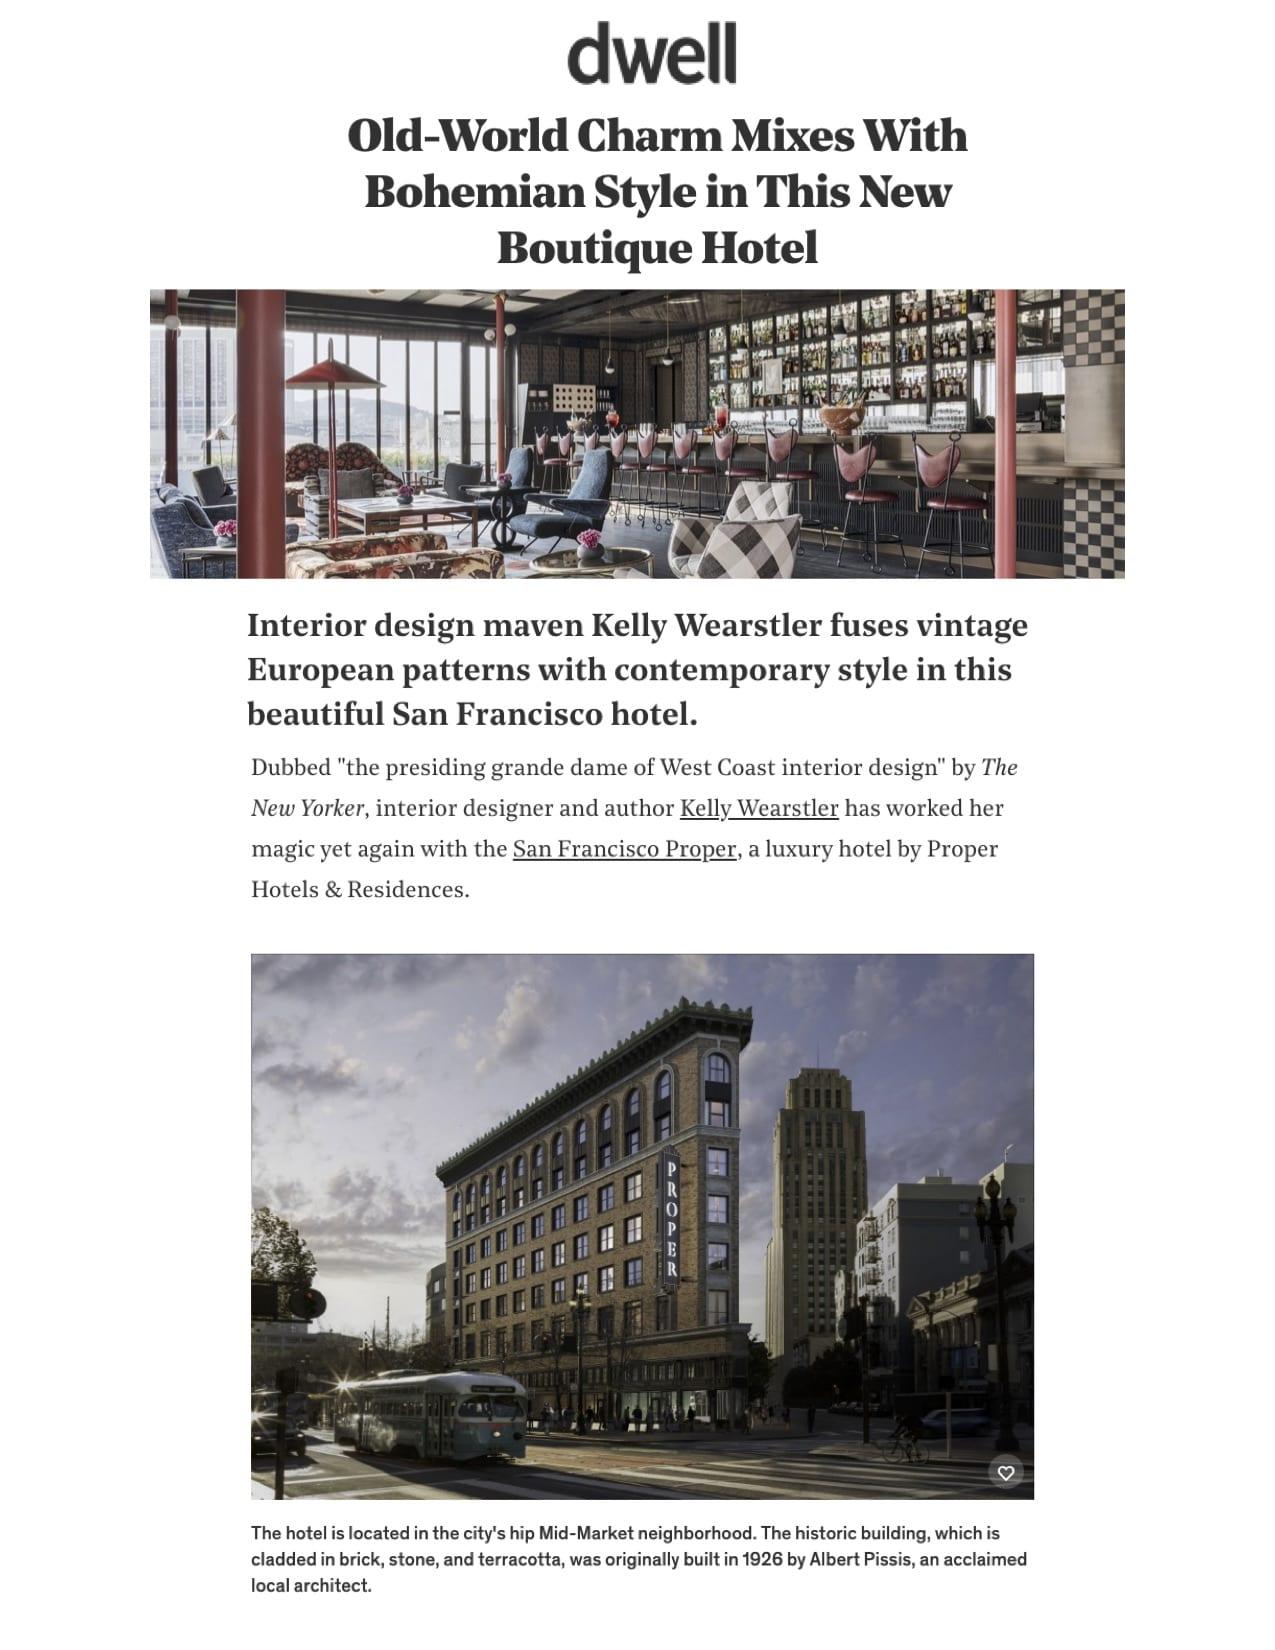 San Francisco Proper Hotel Image